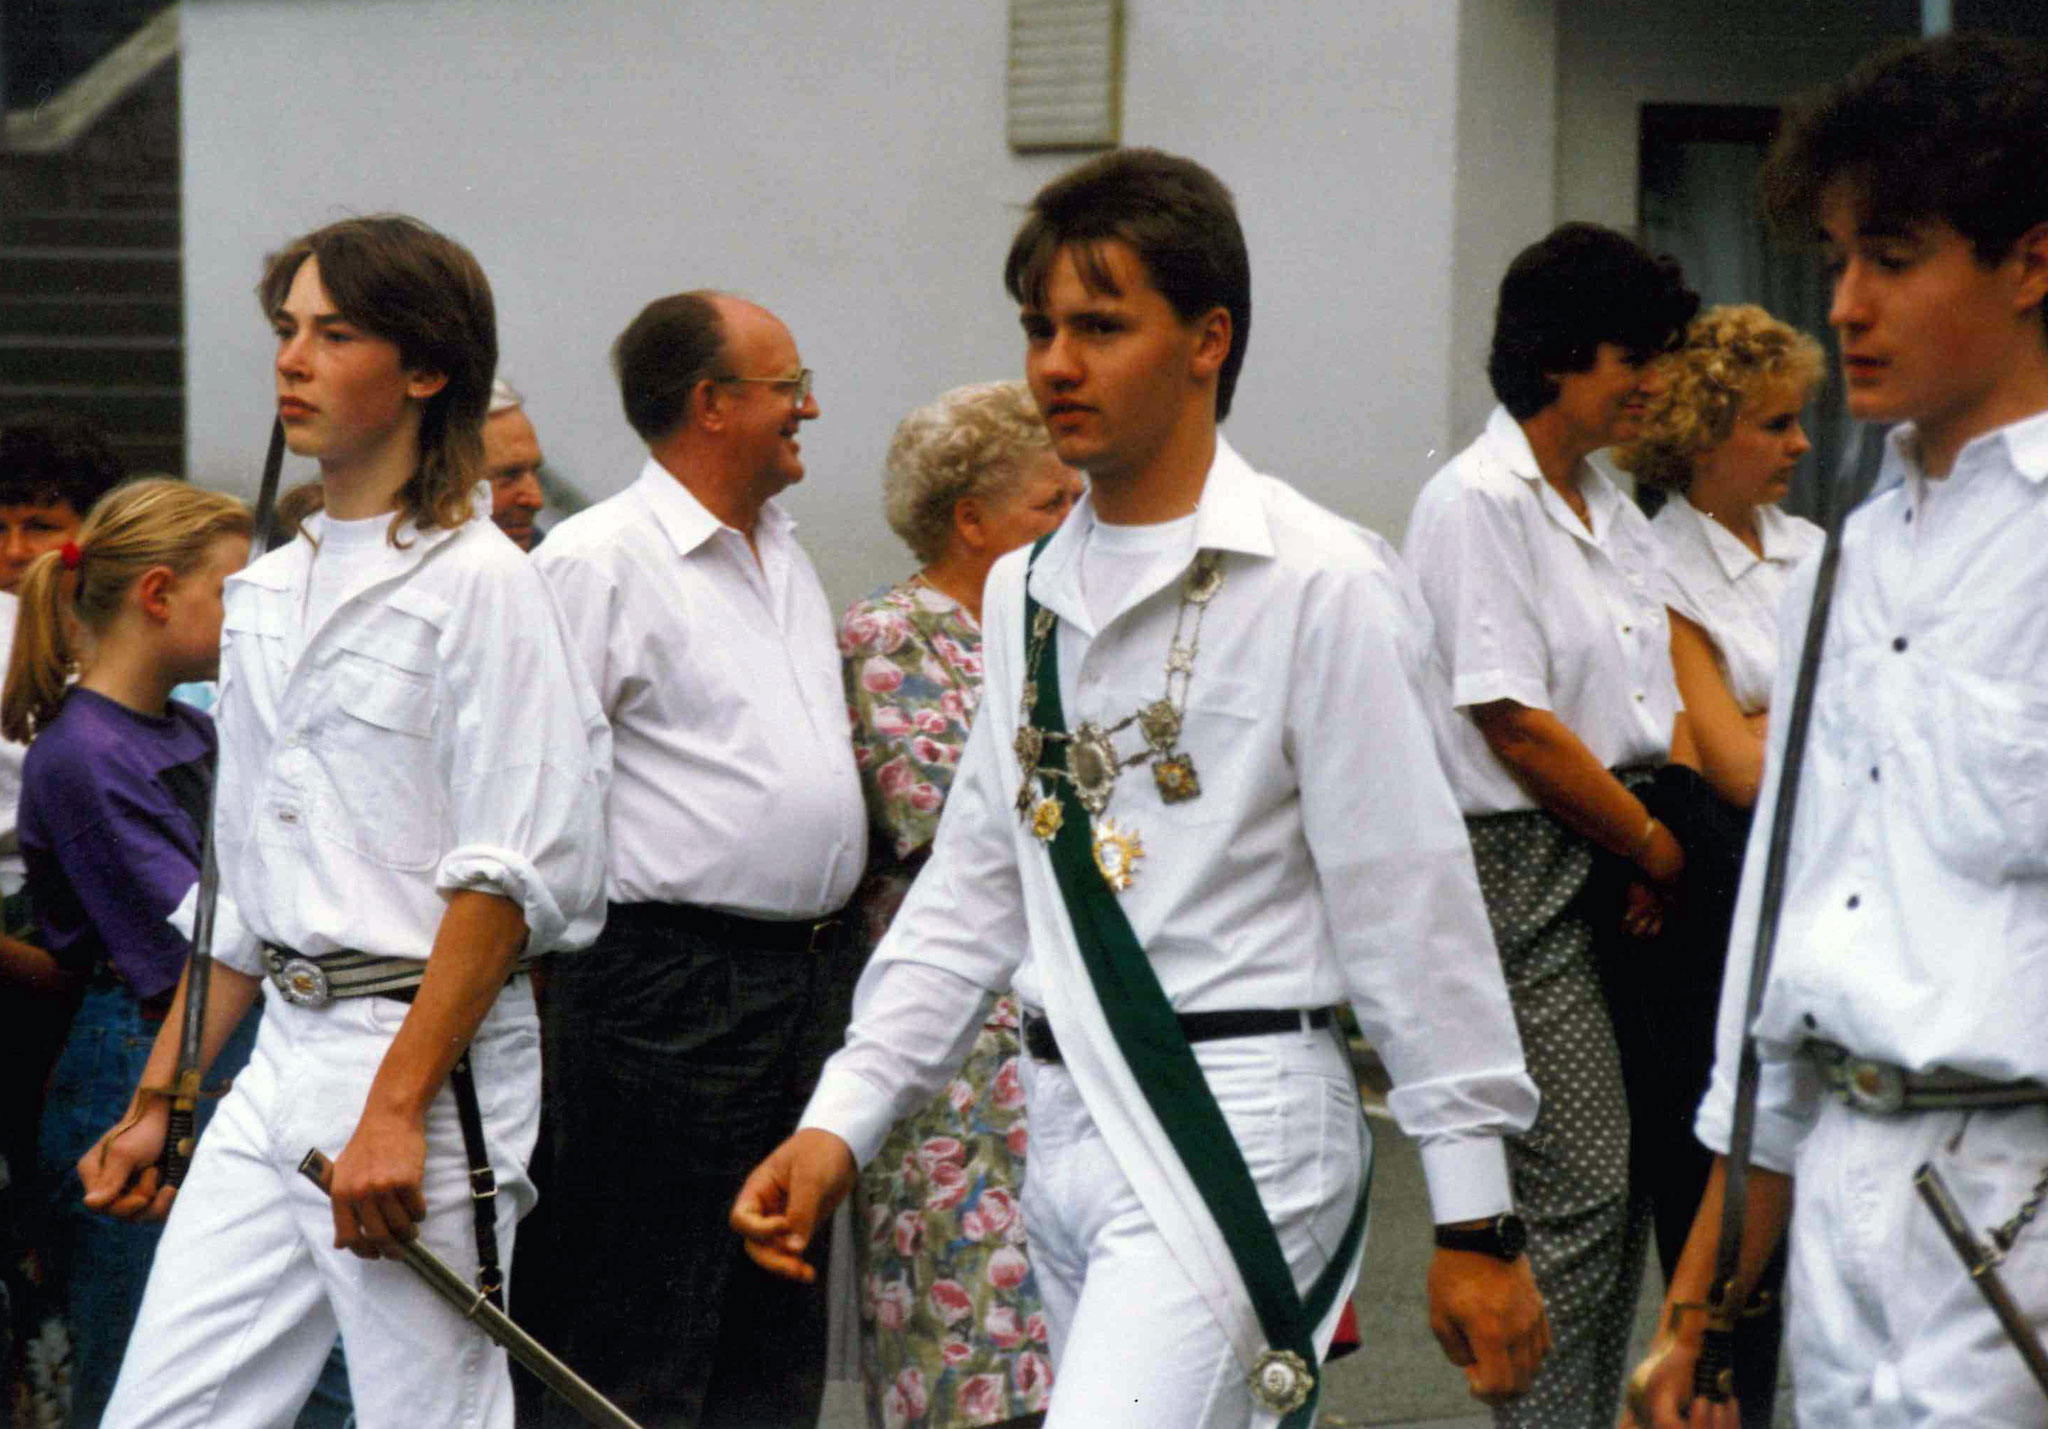 Marc Sternberg 1993